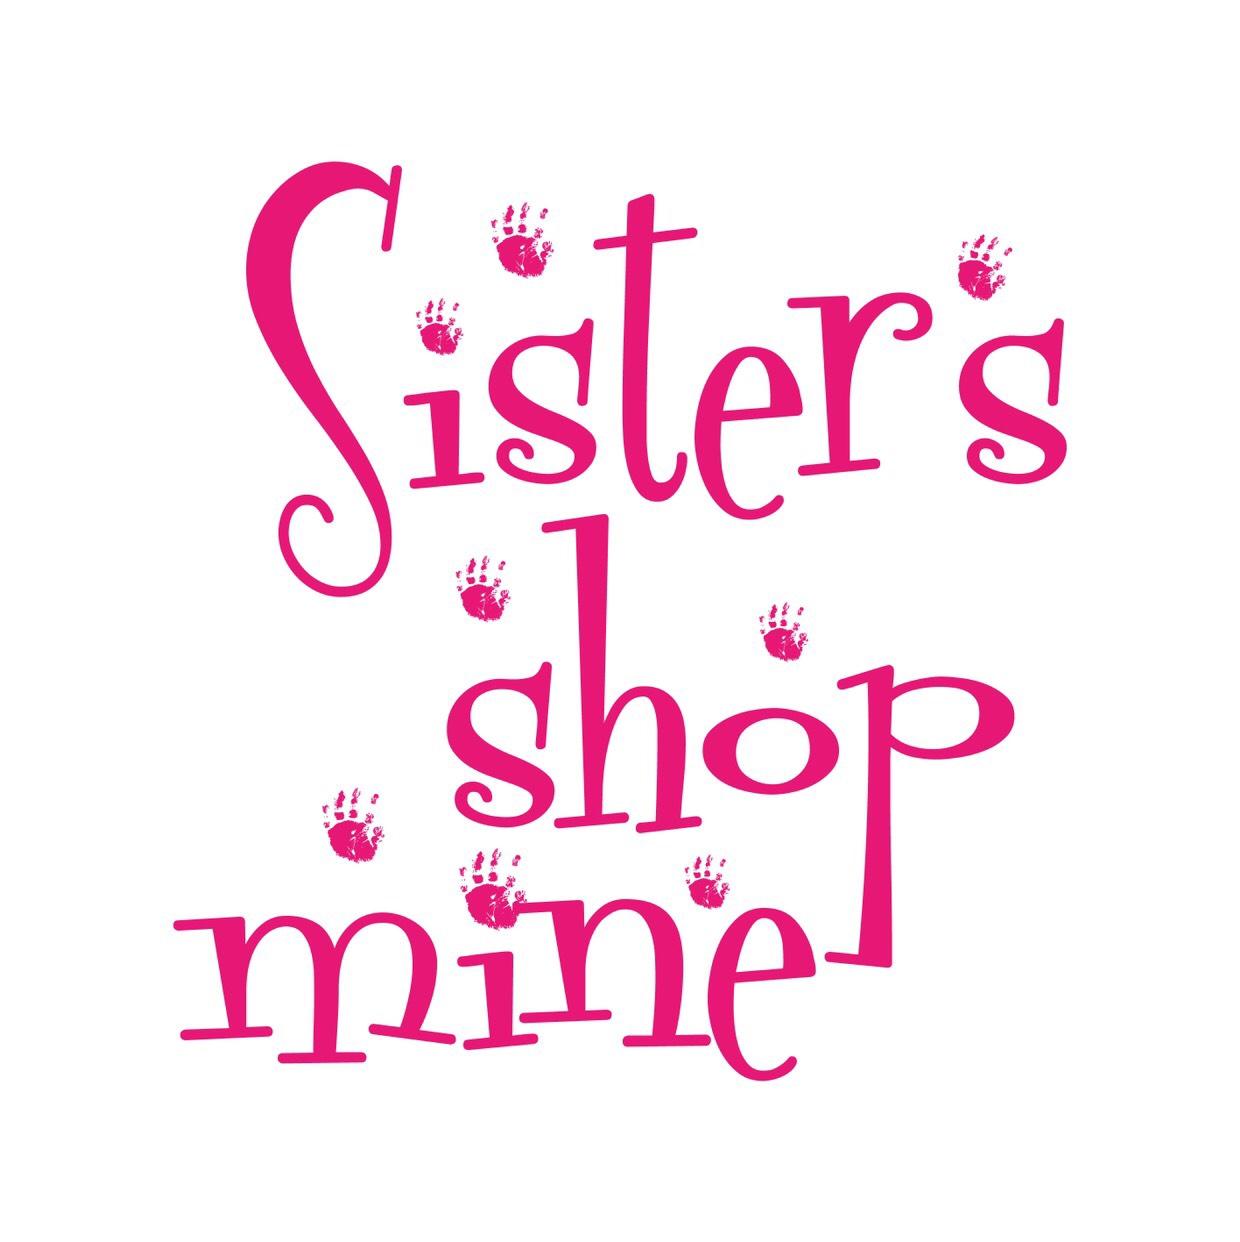 sistersshop mine